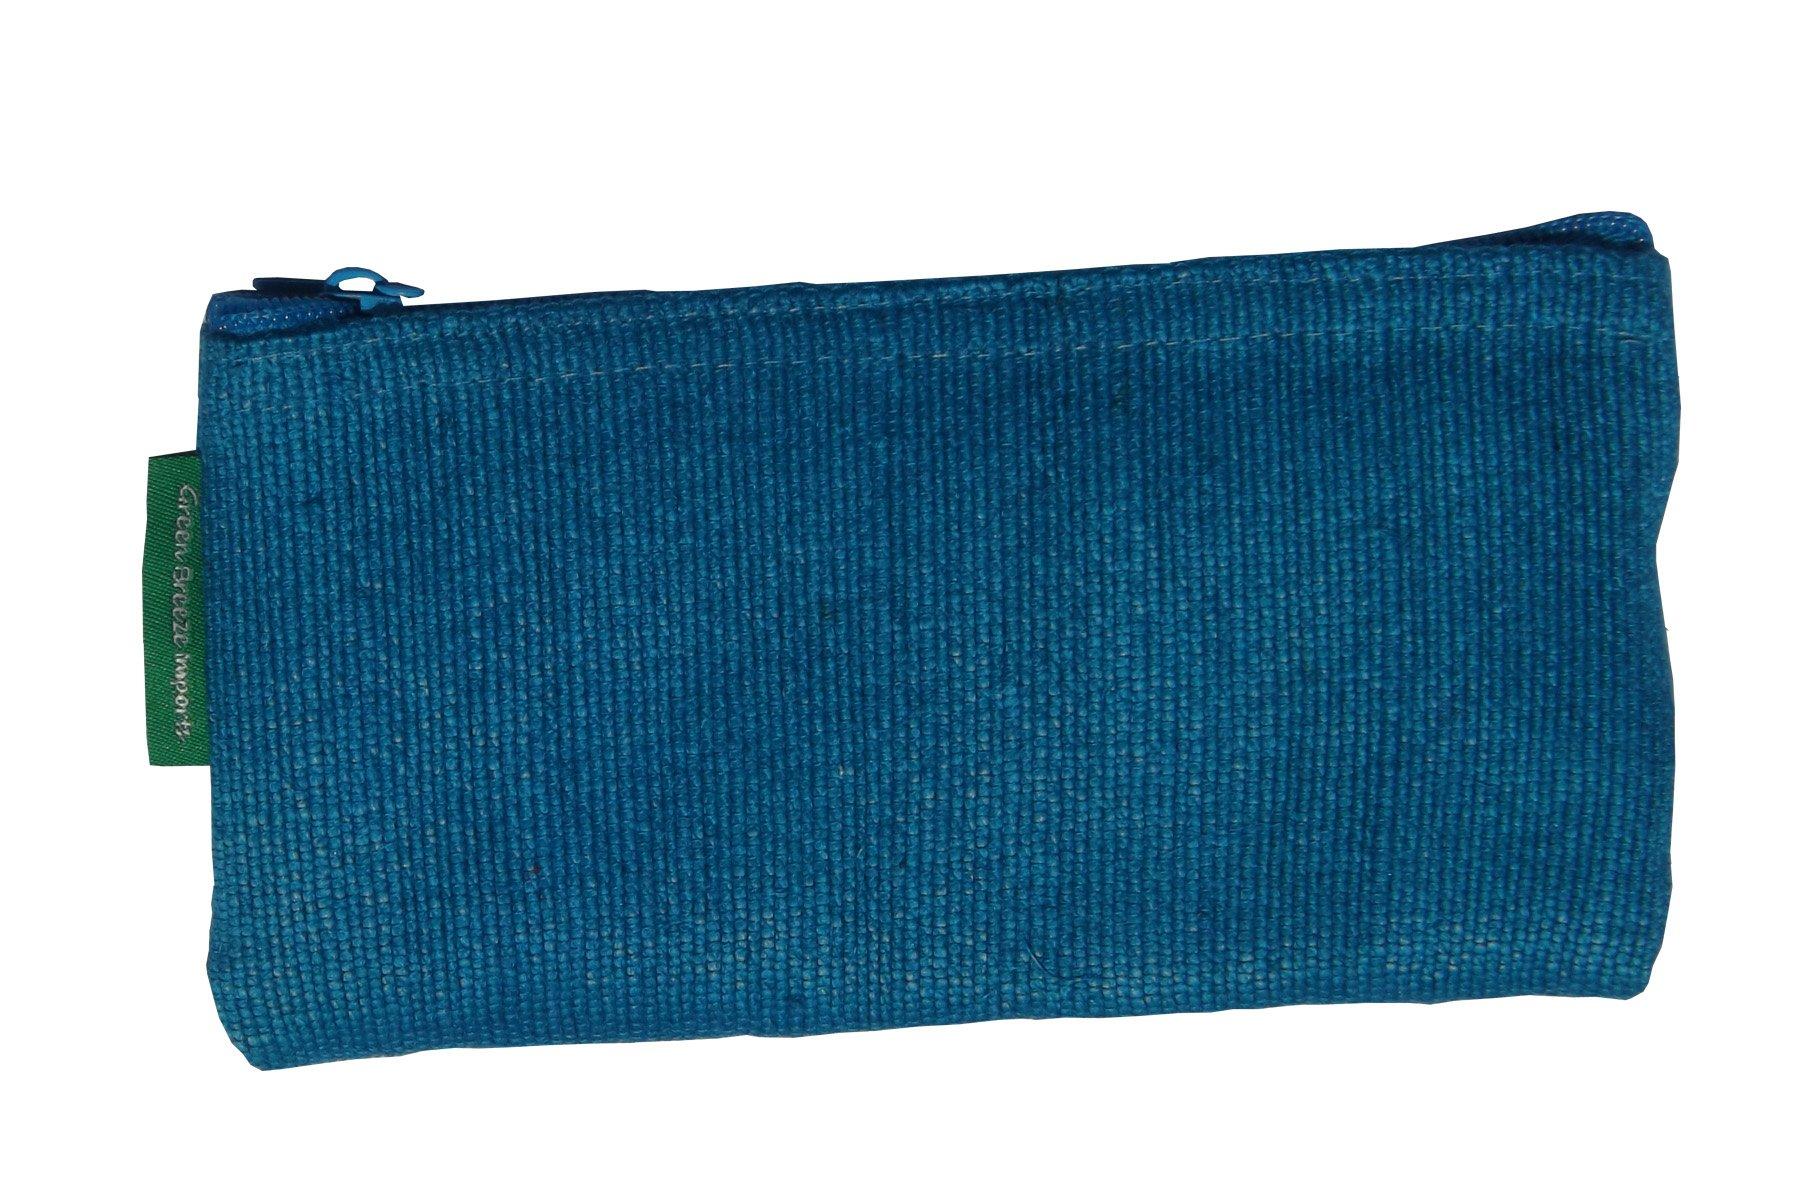 Green Breeze Imports Teal Handmade Abaca Eyeglass Case